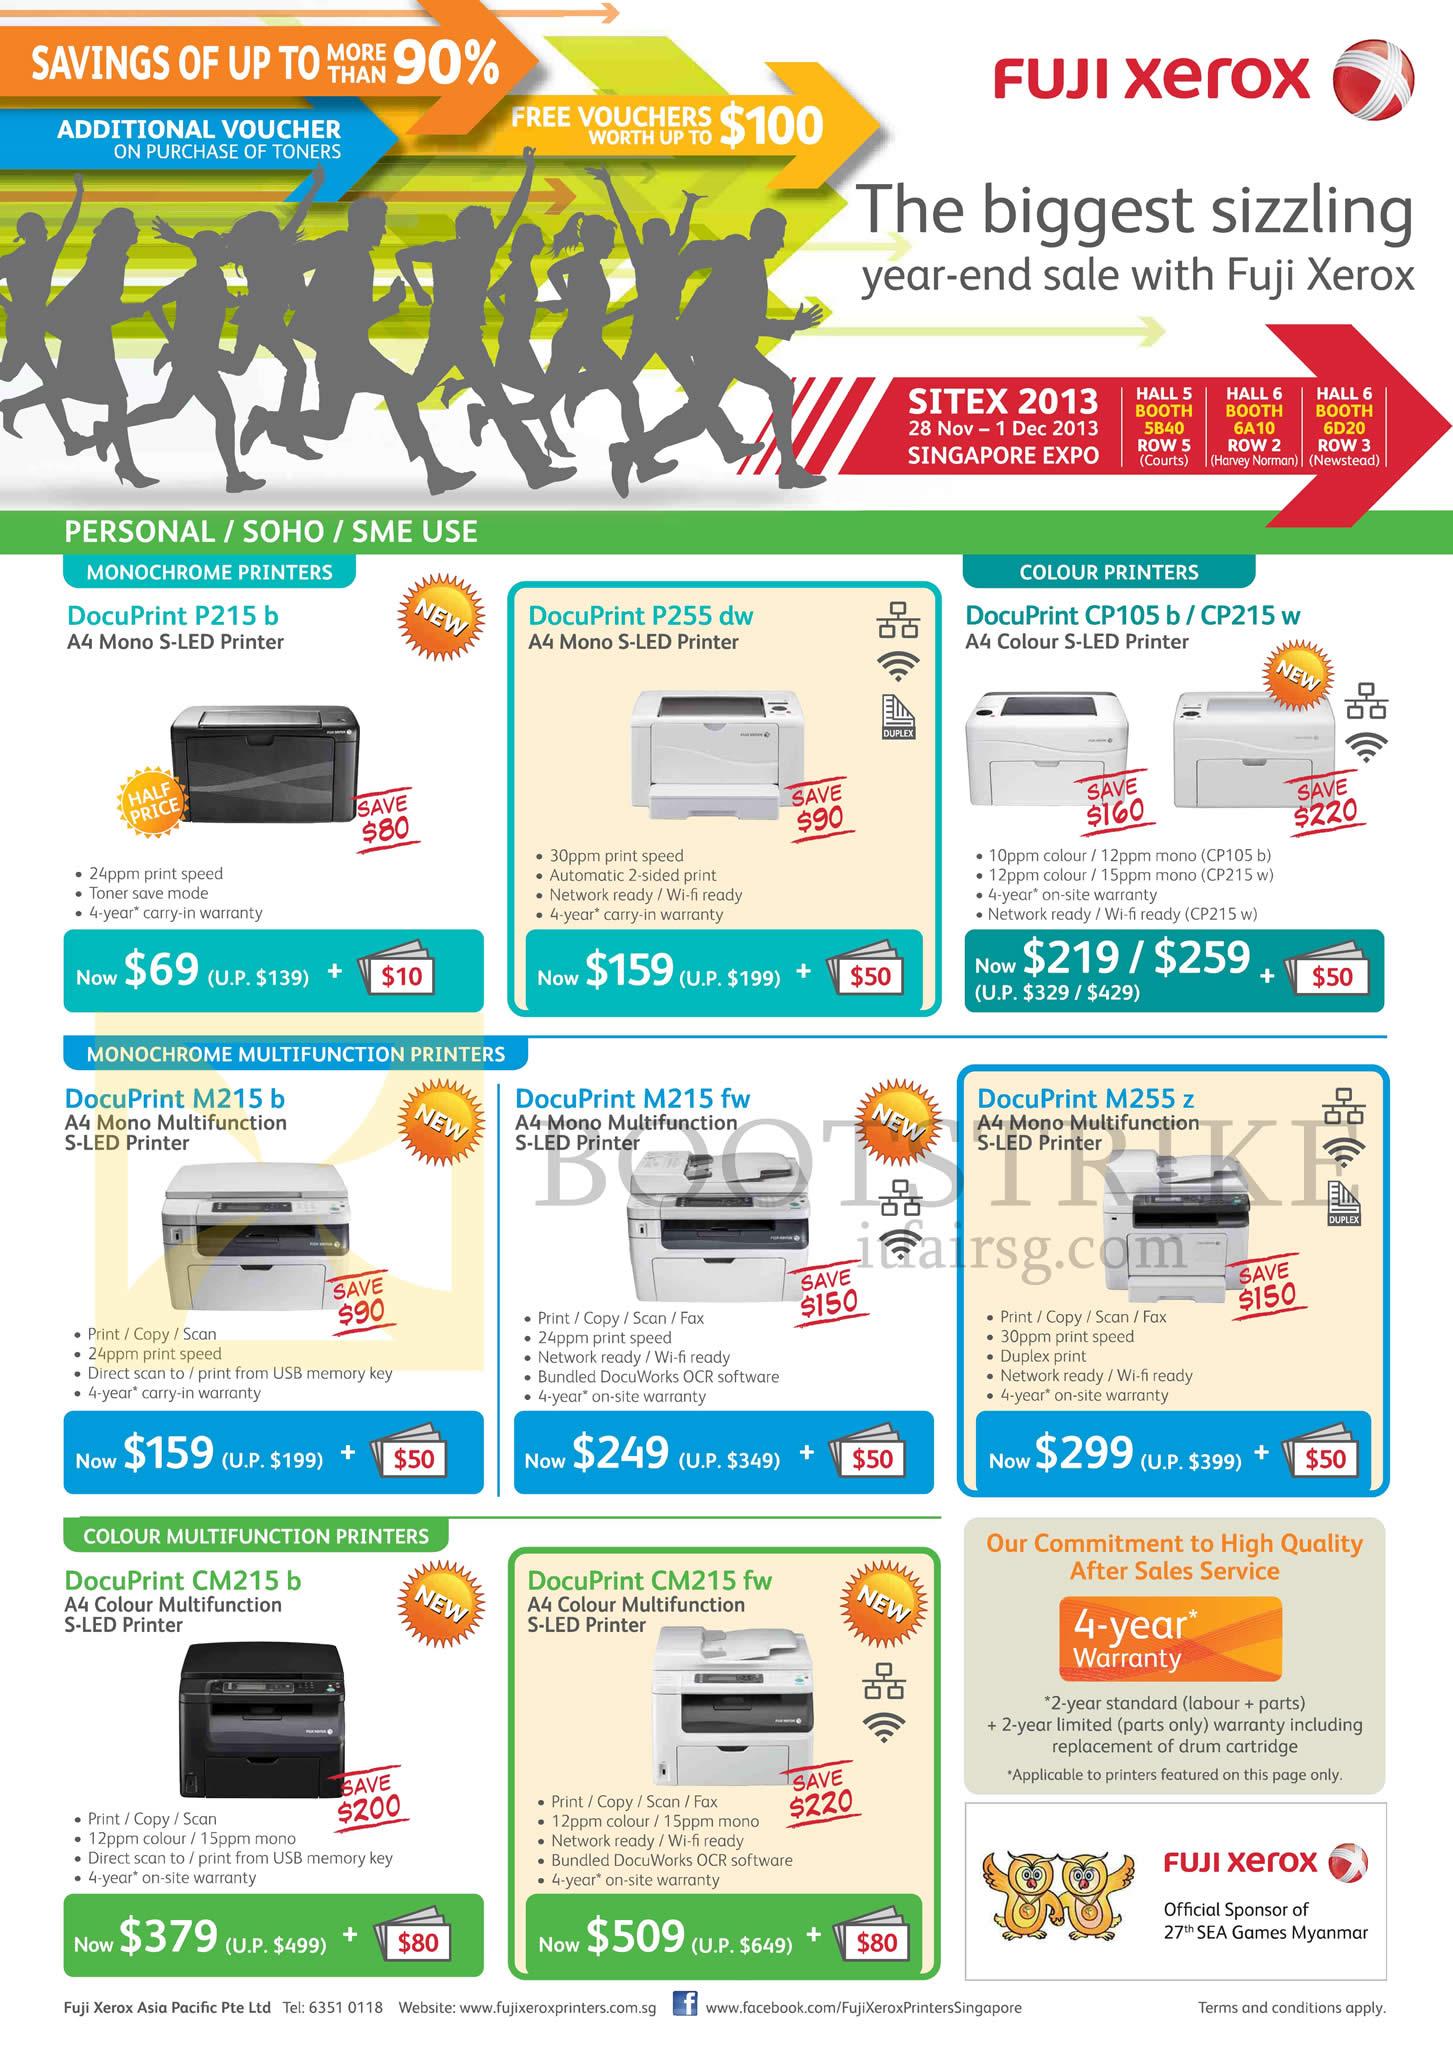 SITEX 2013 price list image brochure of Fuji Xerox Printers S-LED DocuPrint P215b, P255dw, CP105b, CP215W, M215b, M215fw, M255z, CM215b, CM215fw